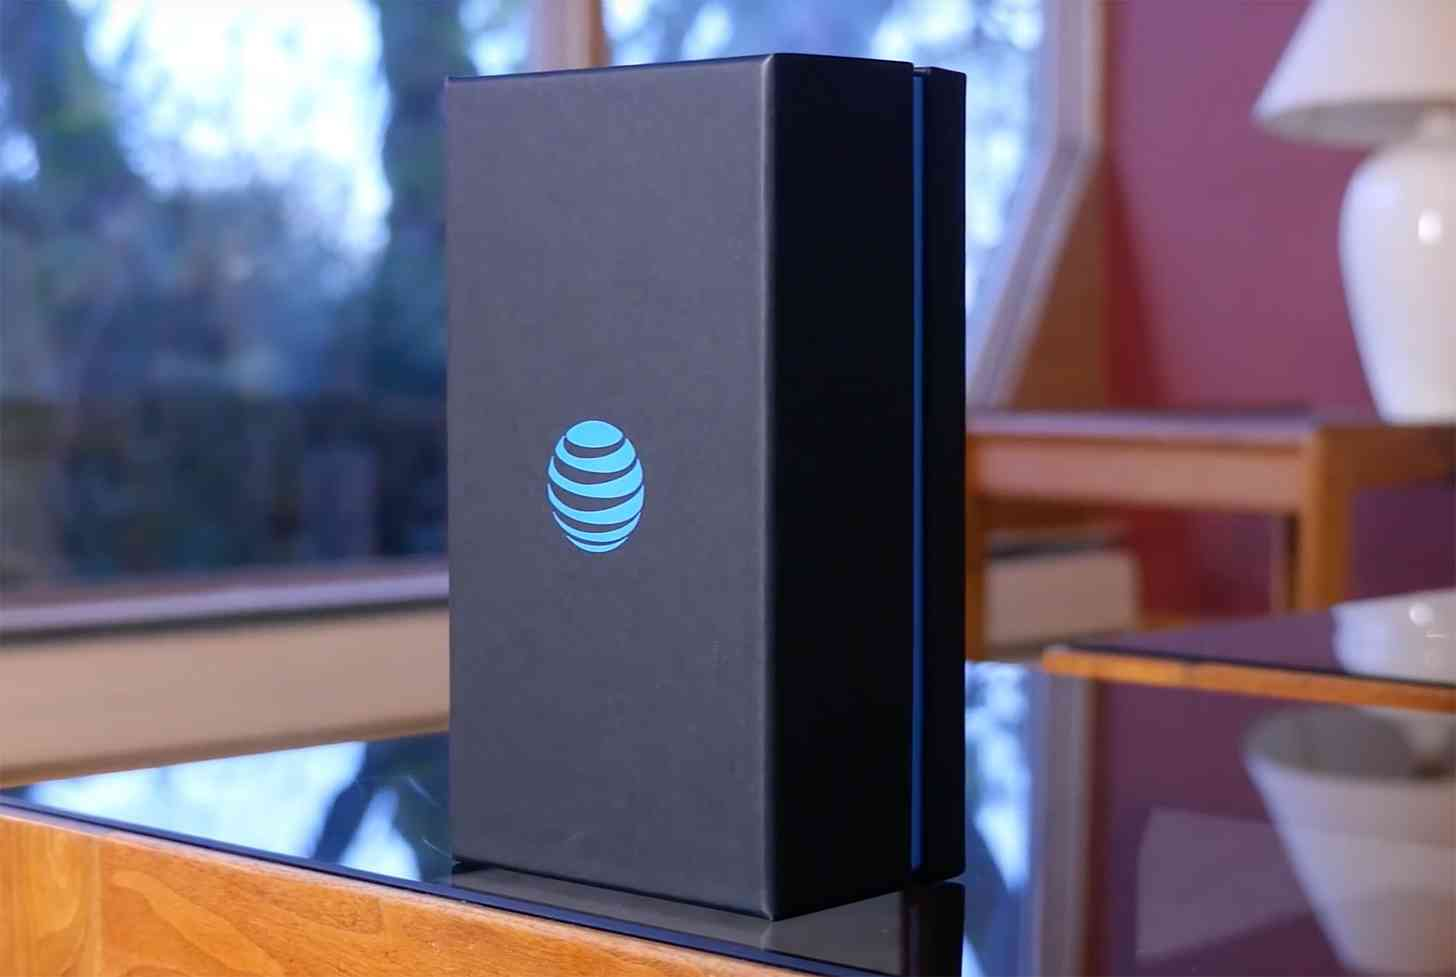 AT&T logo packaging